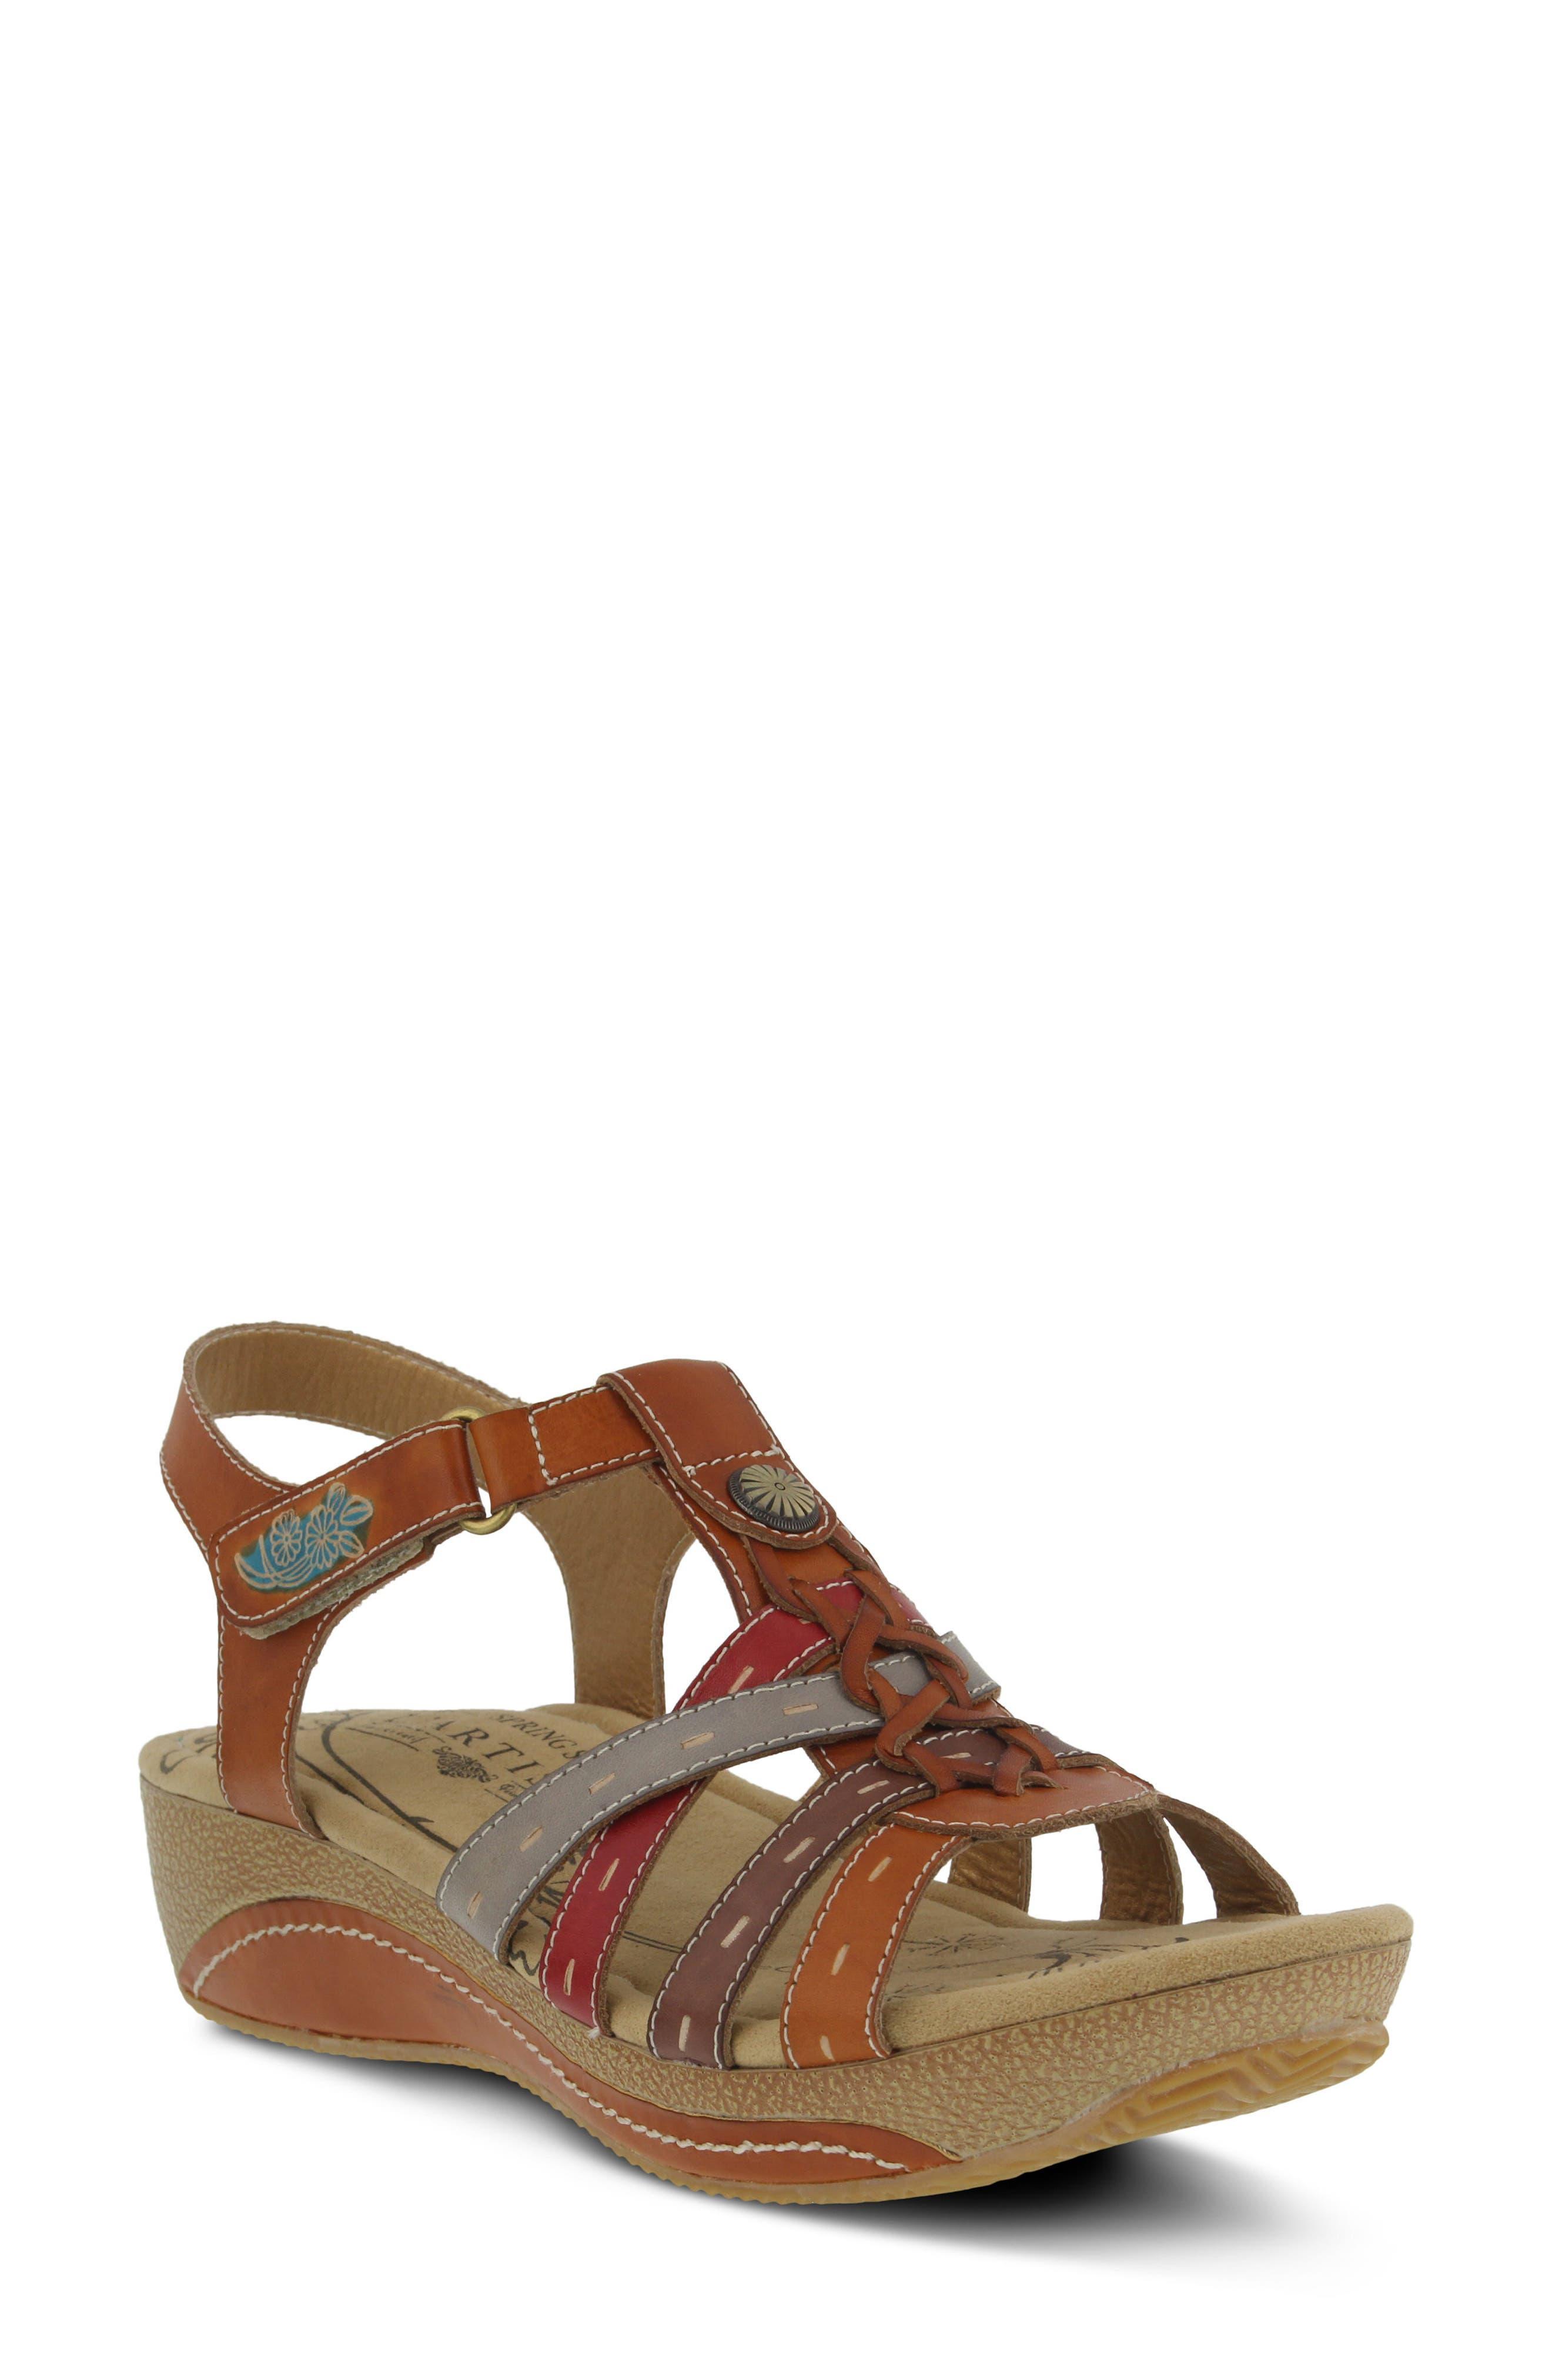 L'Artiste Cloe Sandal,                         Main,                         color, Camel Leather